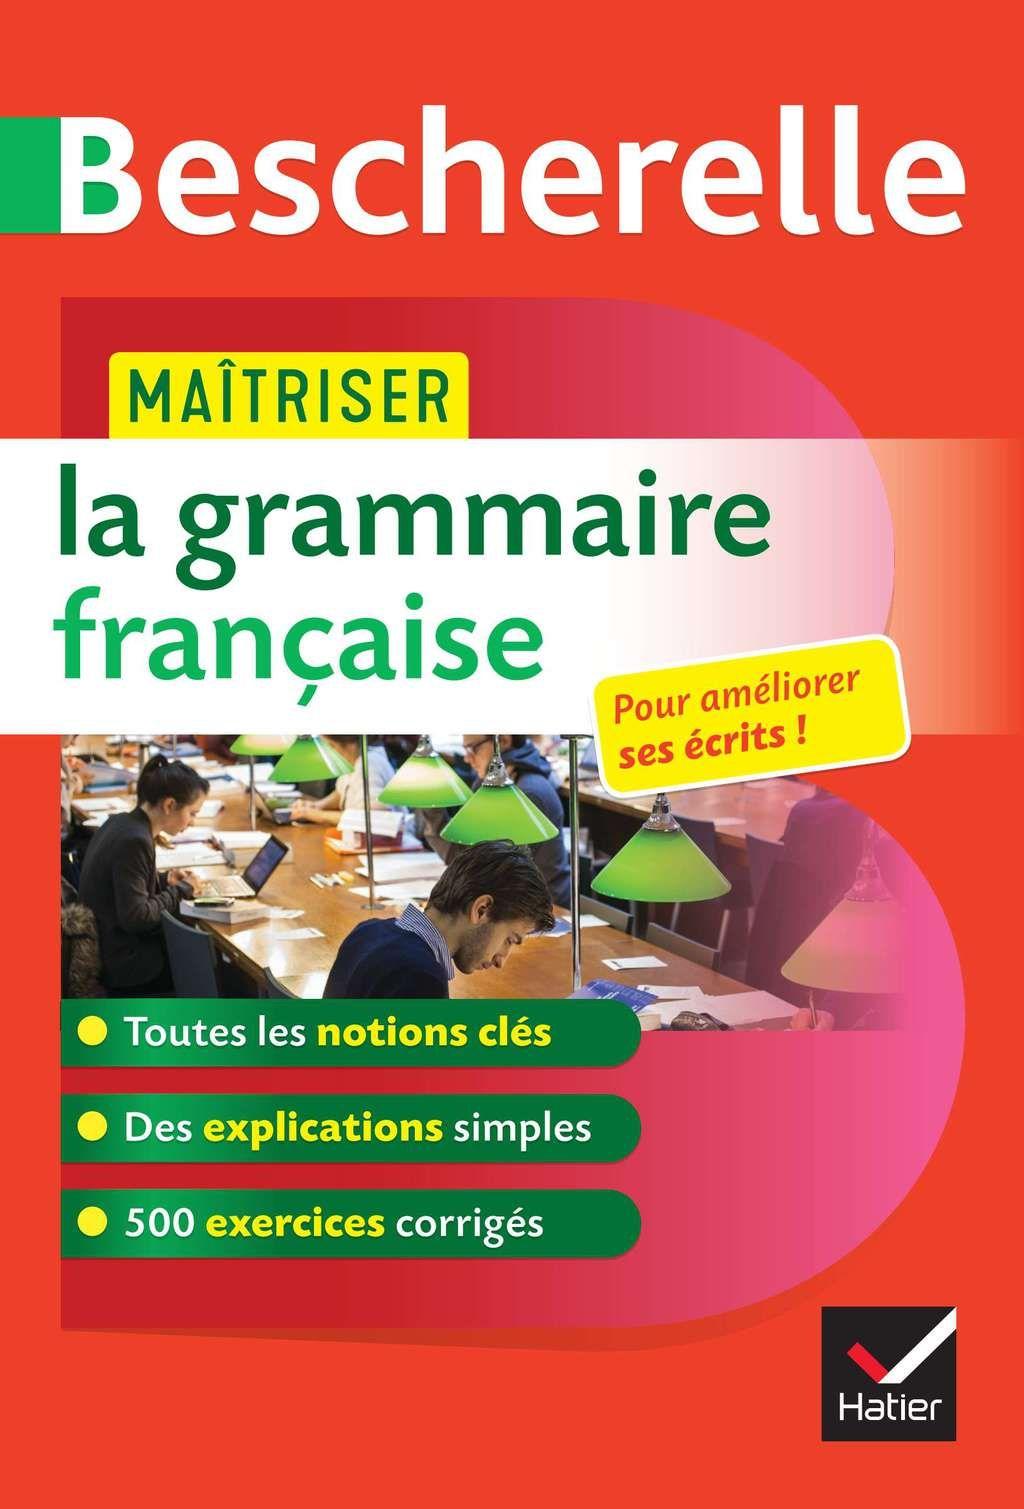 Maitriser La Grammaire Francaise Ebook Top Books Books Ebook